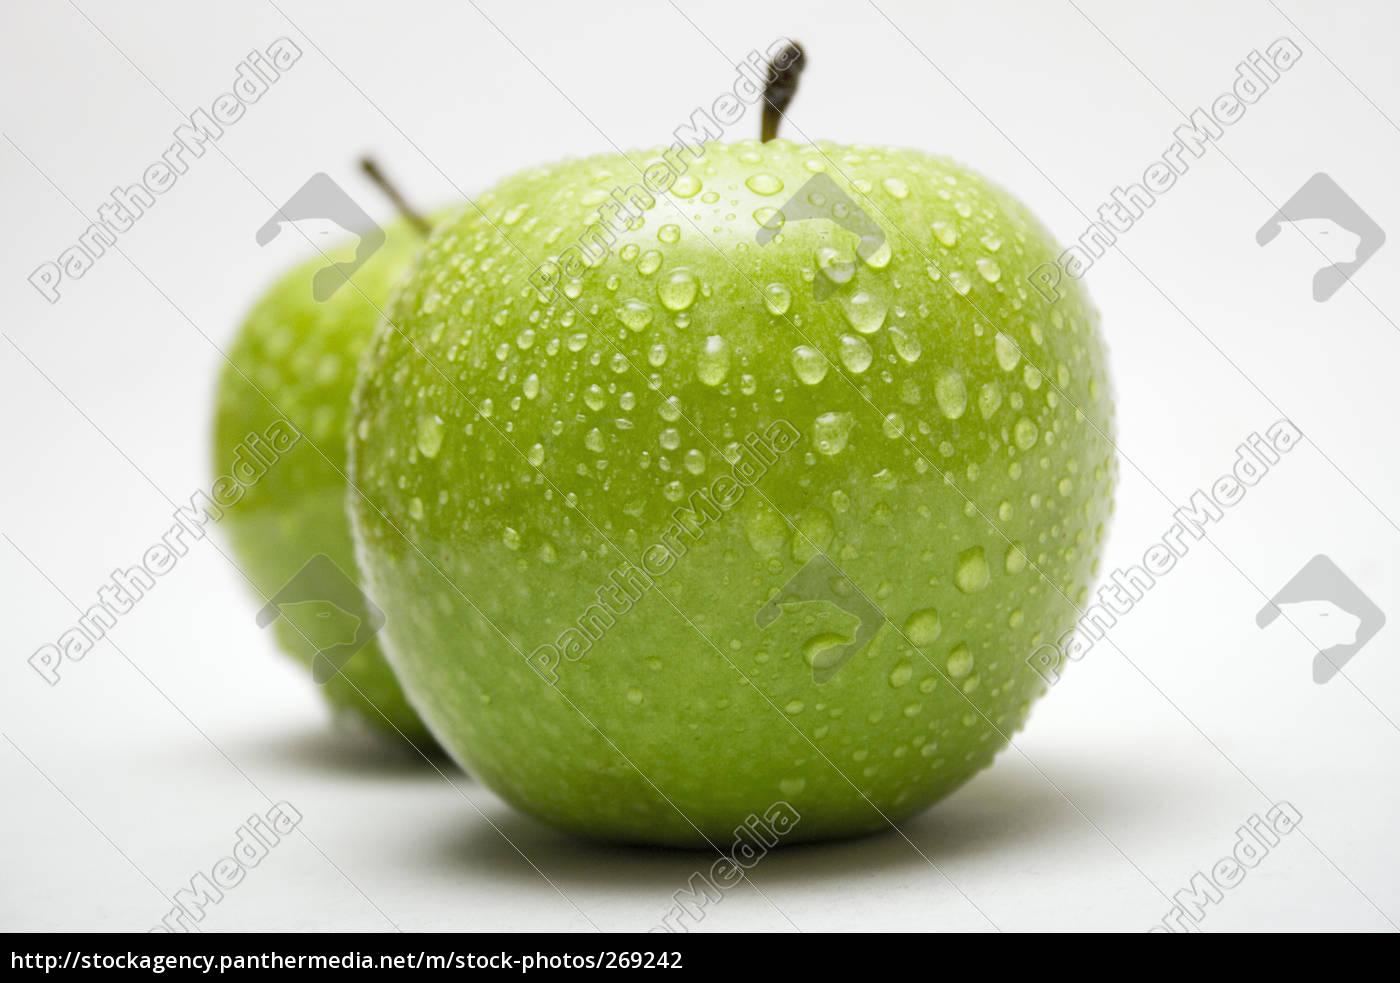 wet, green, apples, in, row - 269242